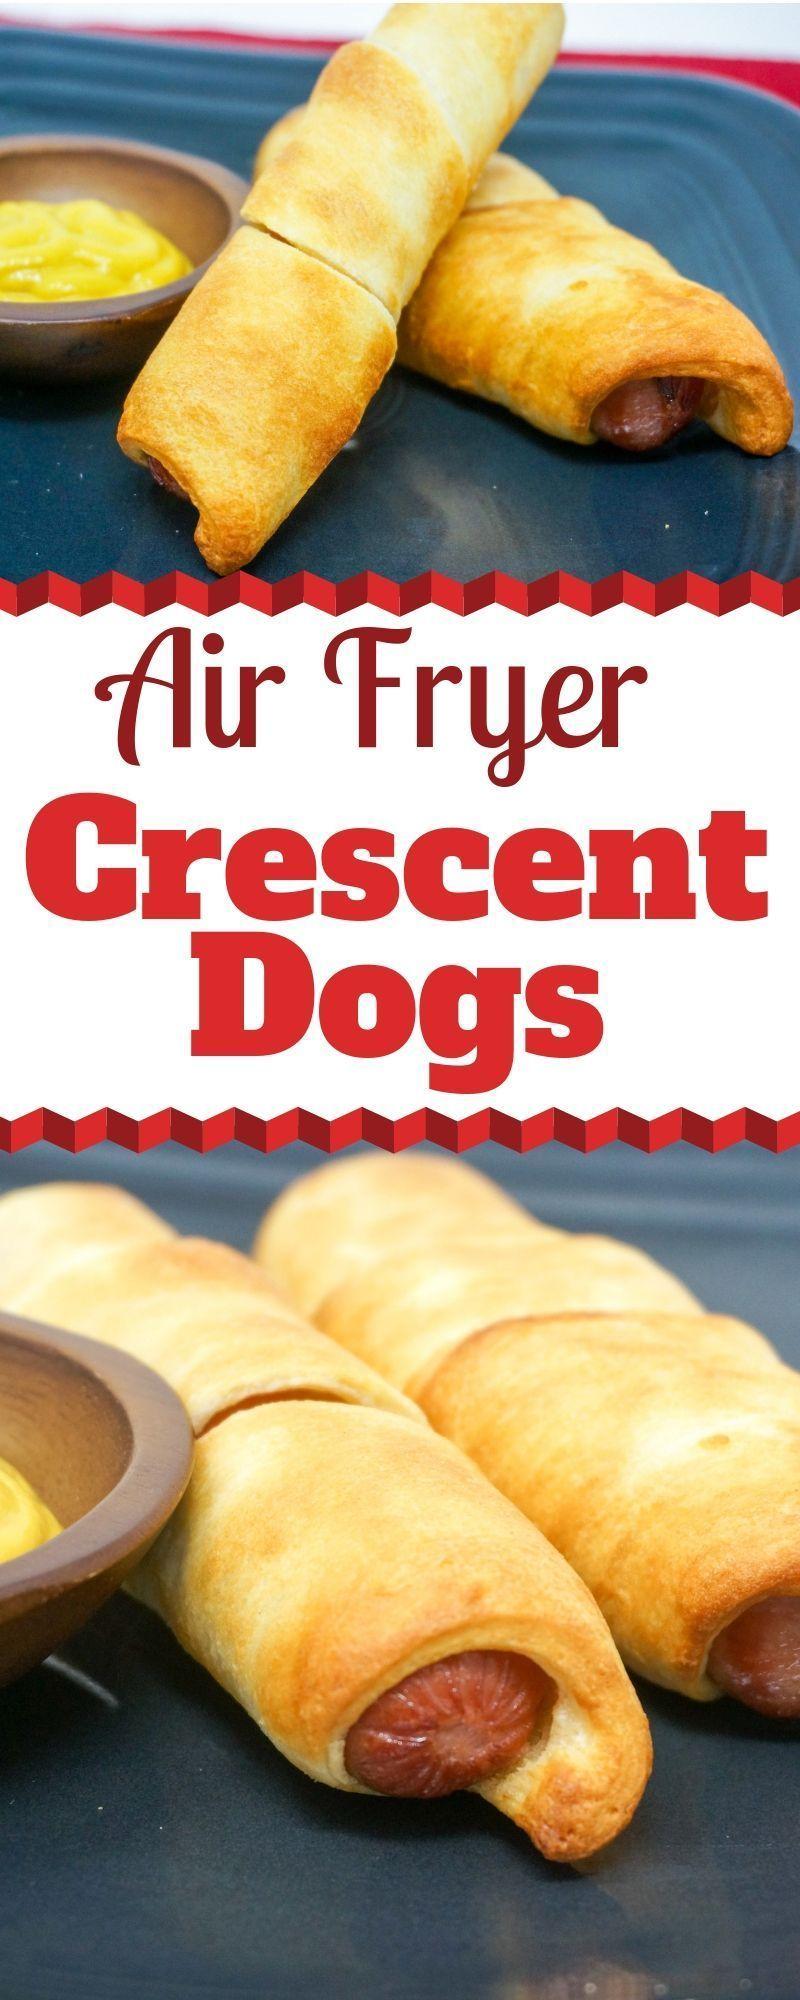 Air Fryer Crescent Dogs | Grace Like Rain Blog #airfryerrecipes